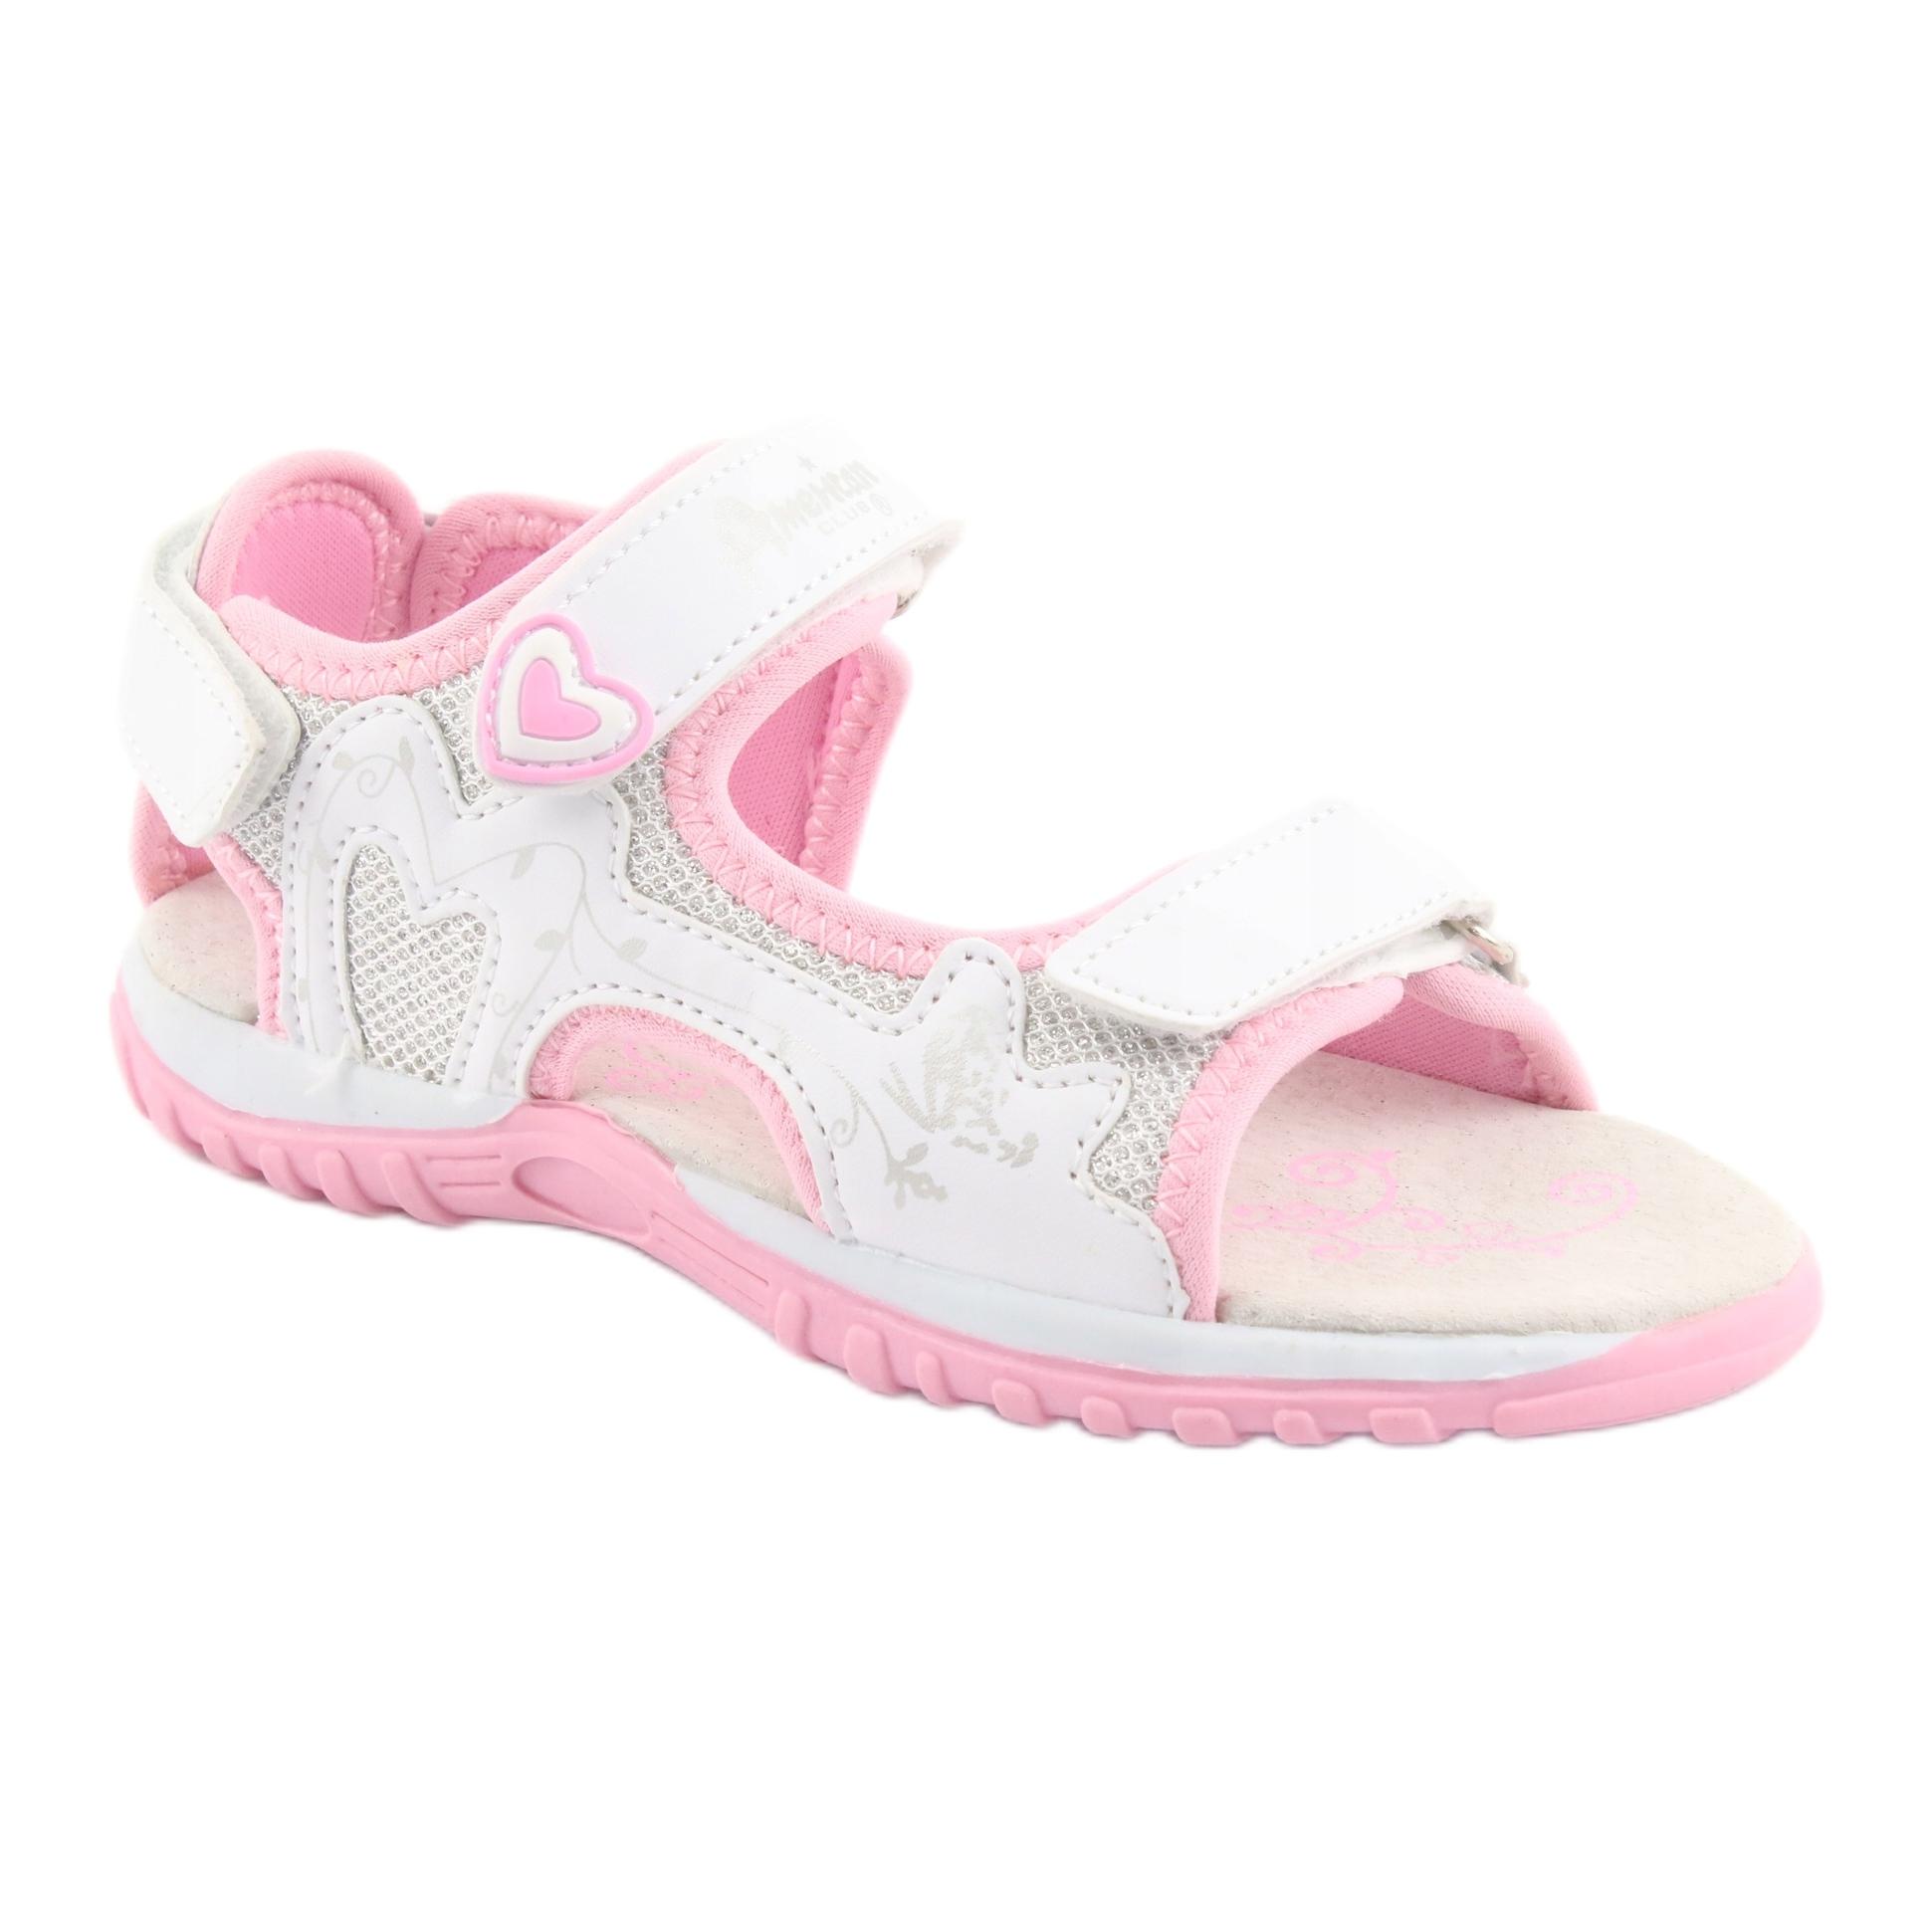 miniatura 2 - Sandali da donna di American Club bianco grigio rosa